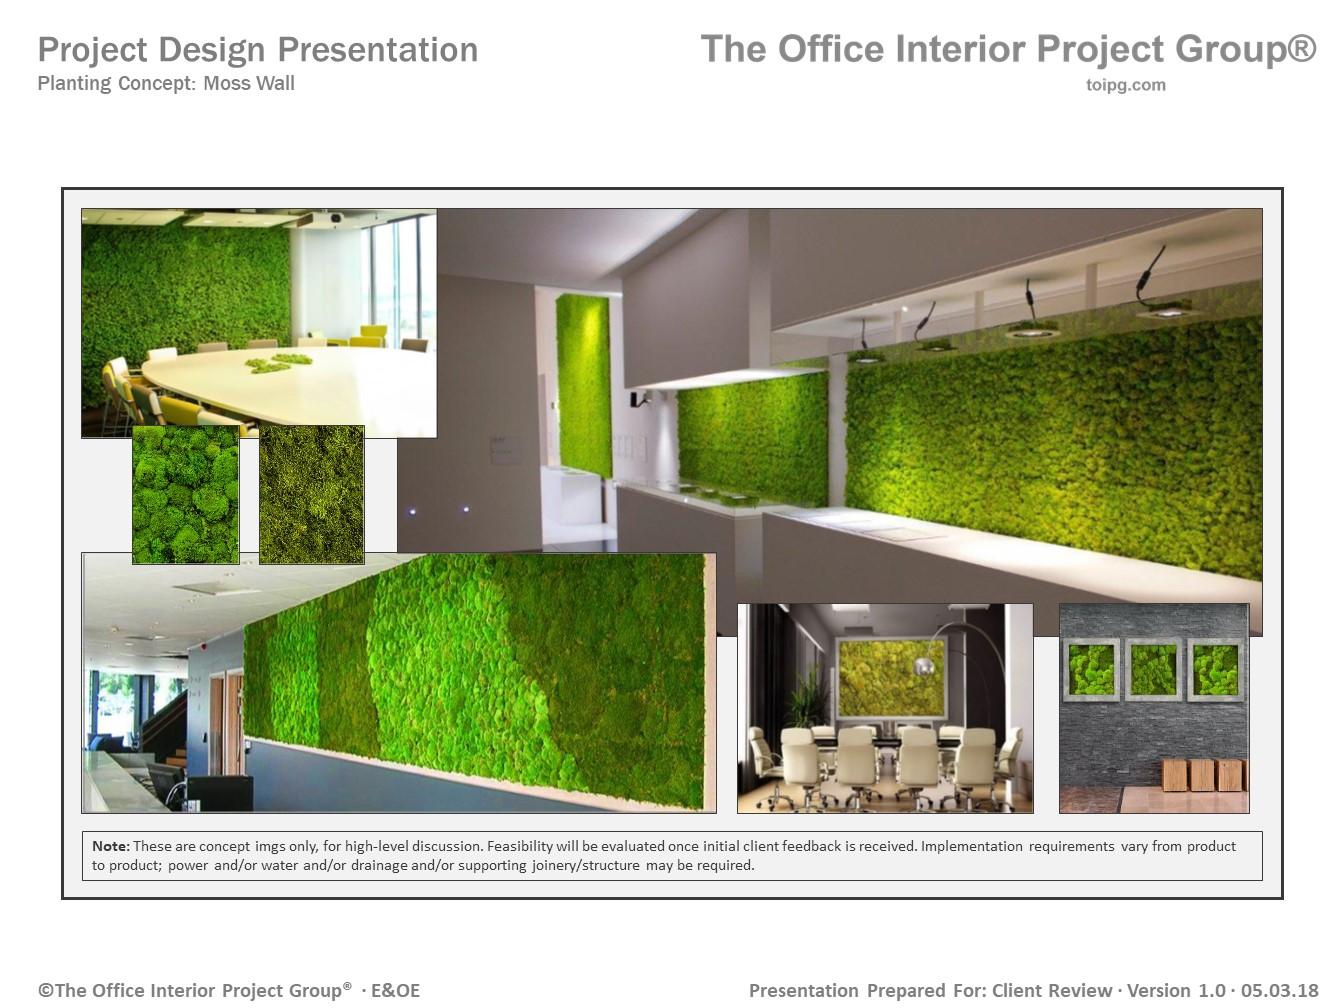 TOIPG® Design Presentation - Planting Concepts - Moss Wall - 05.03.18.jpg